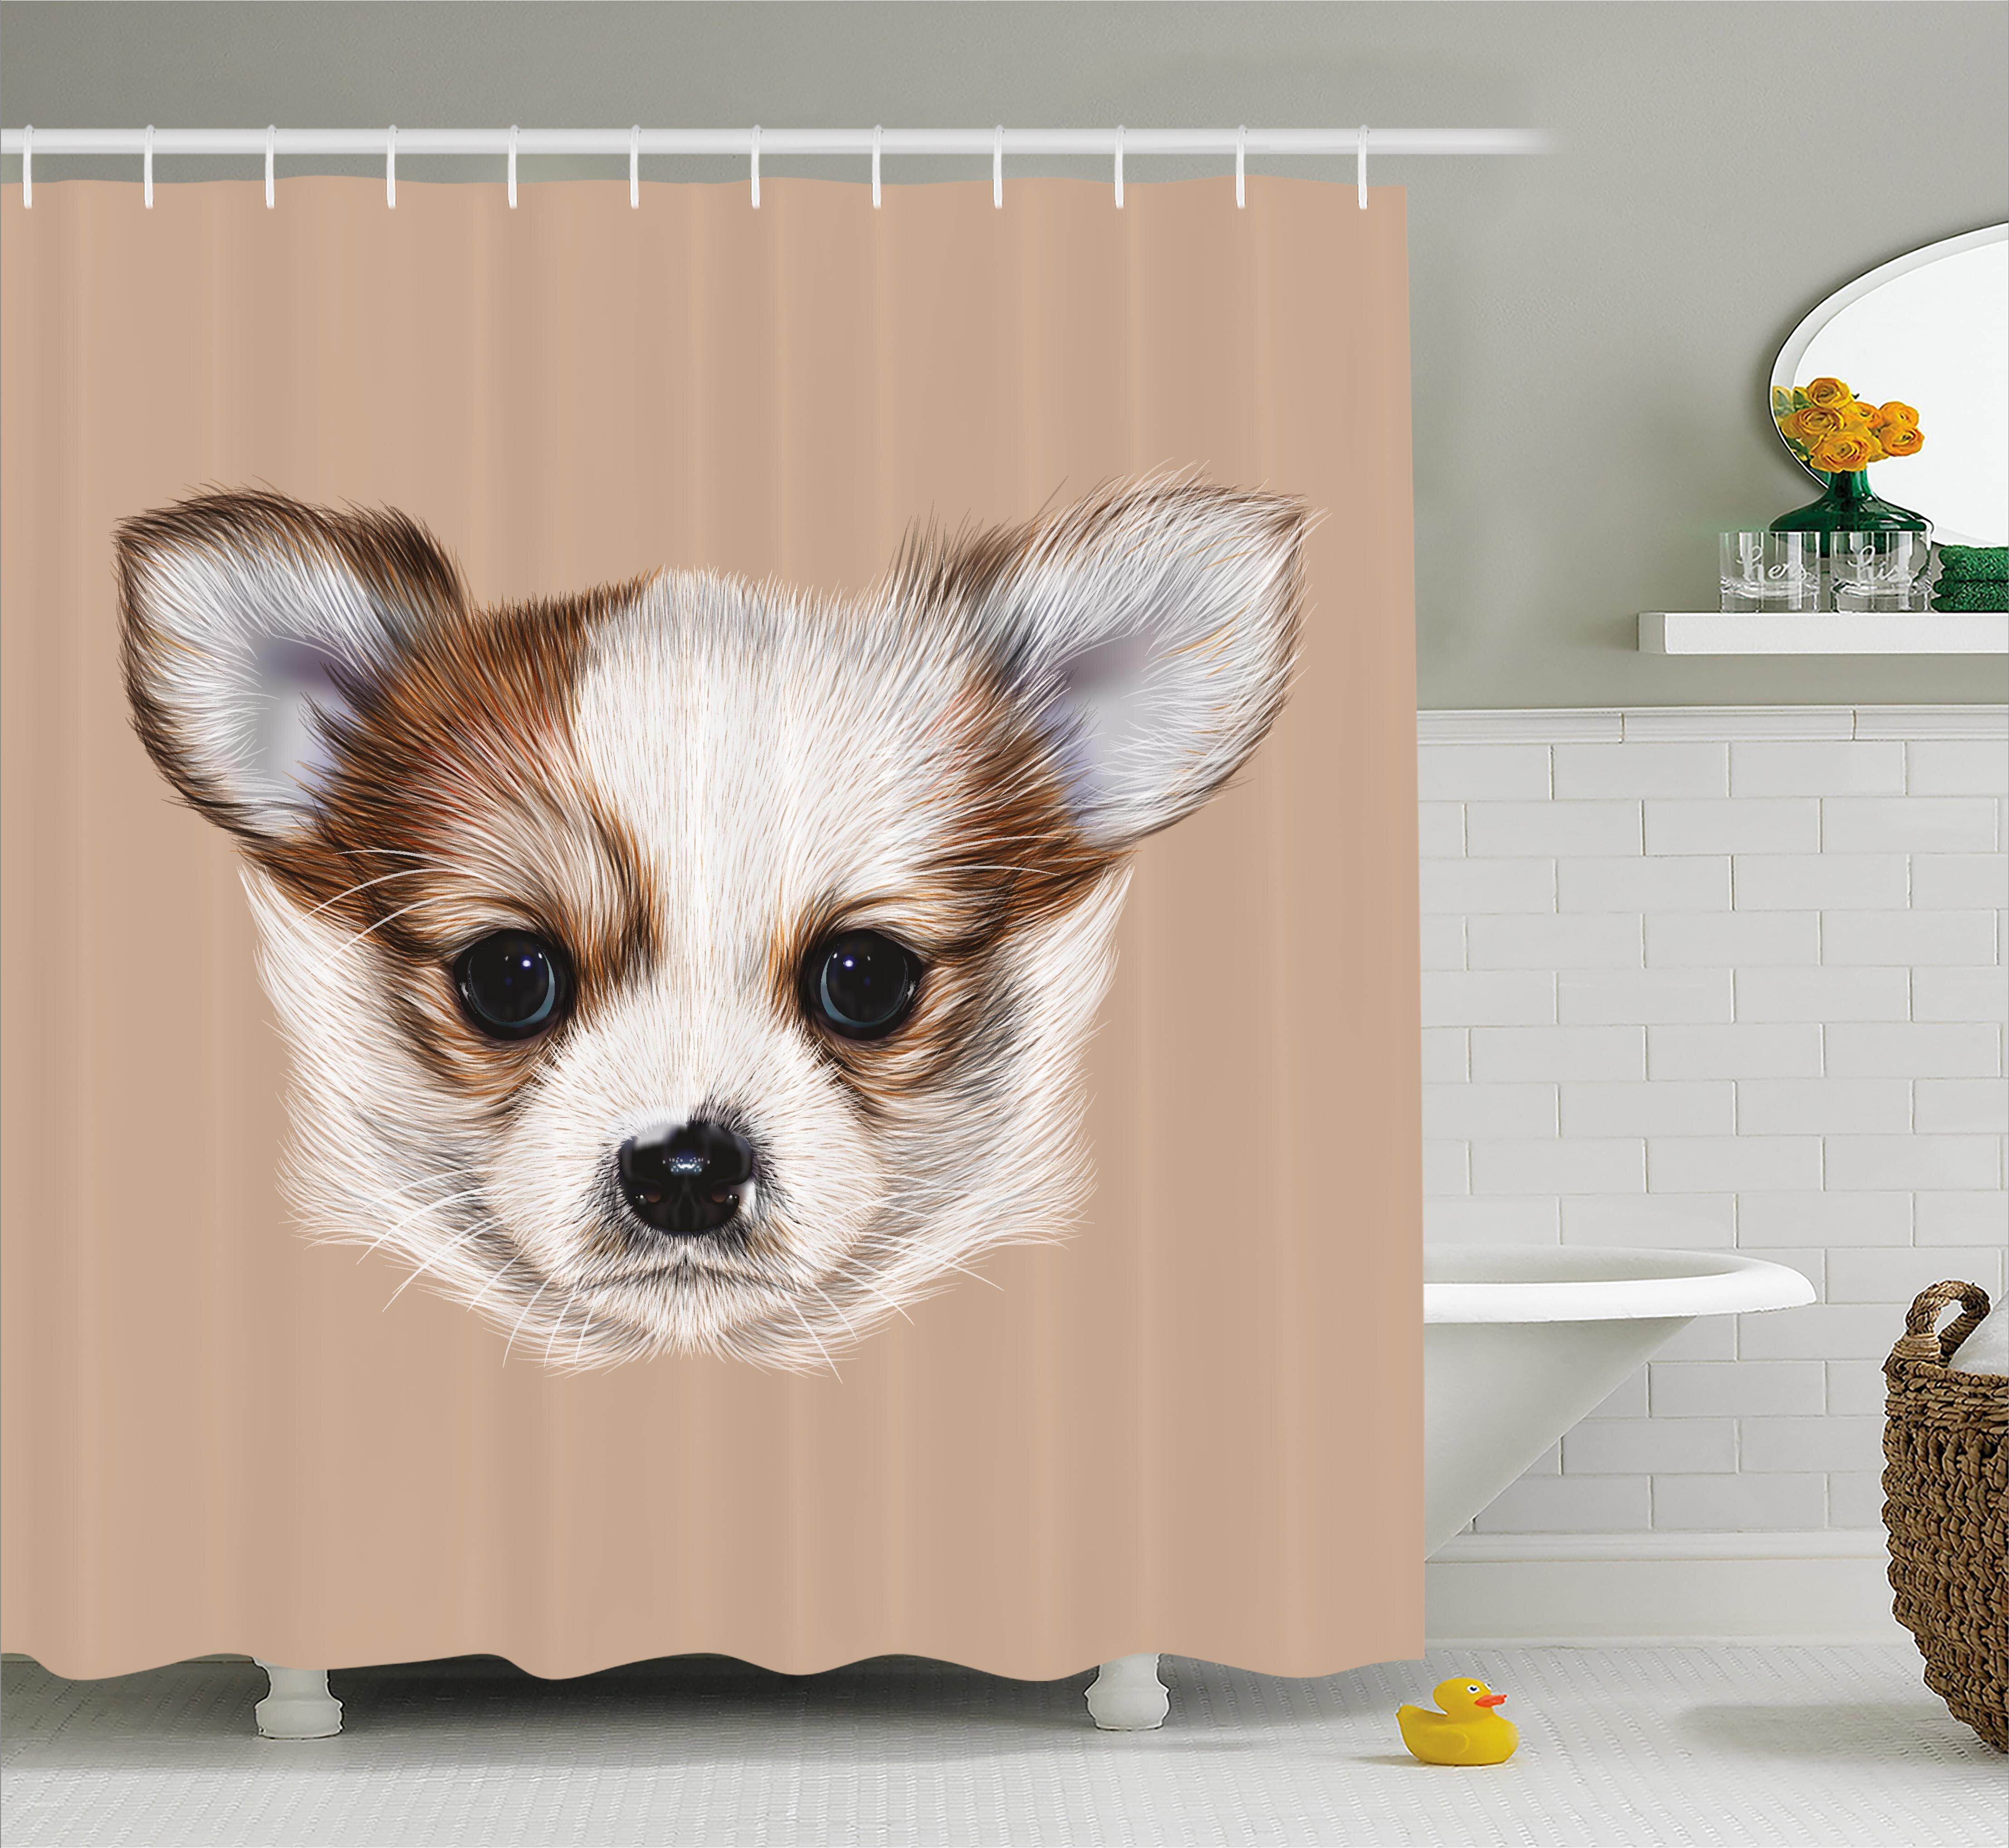 East Urban Home Puppy Portrait Shower Curtain